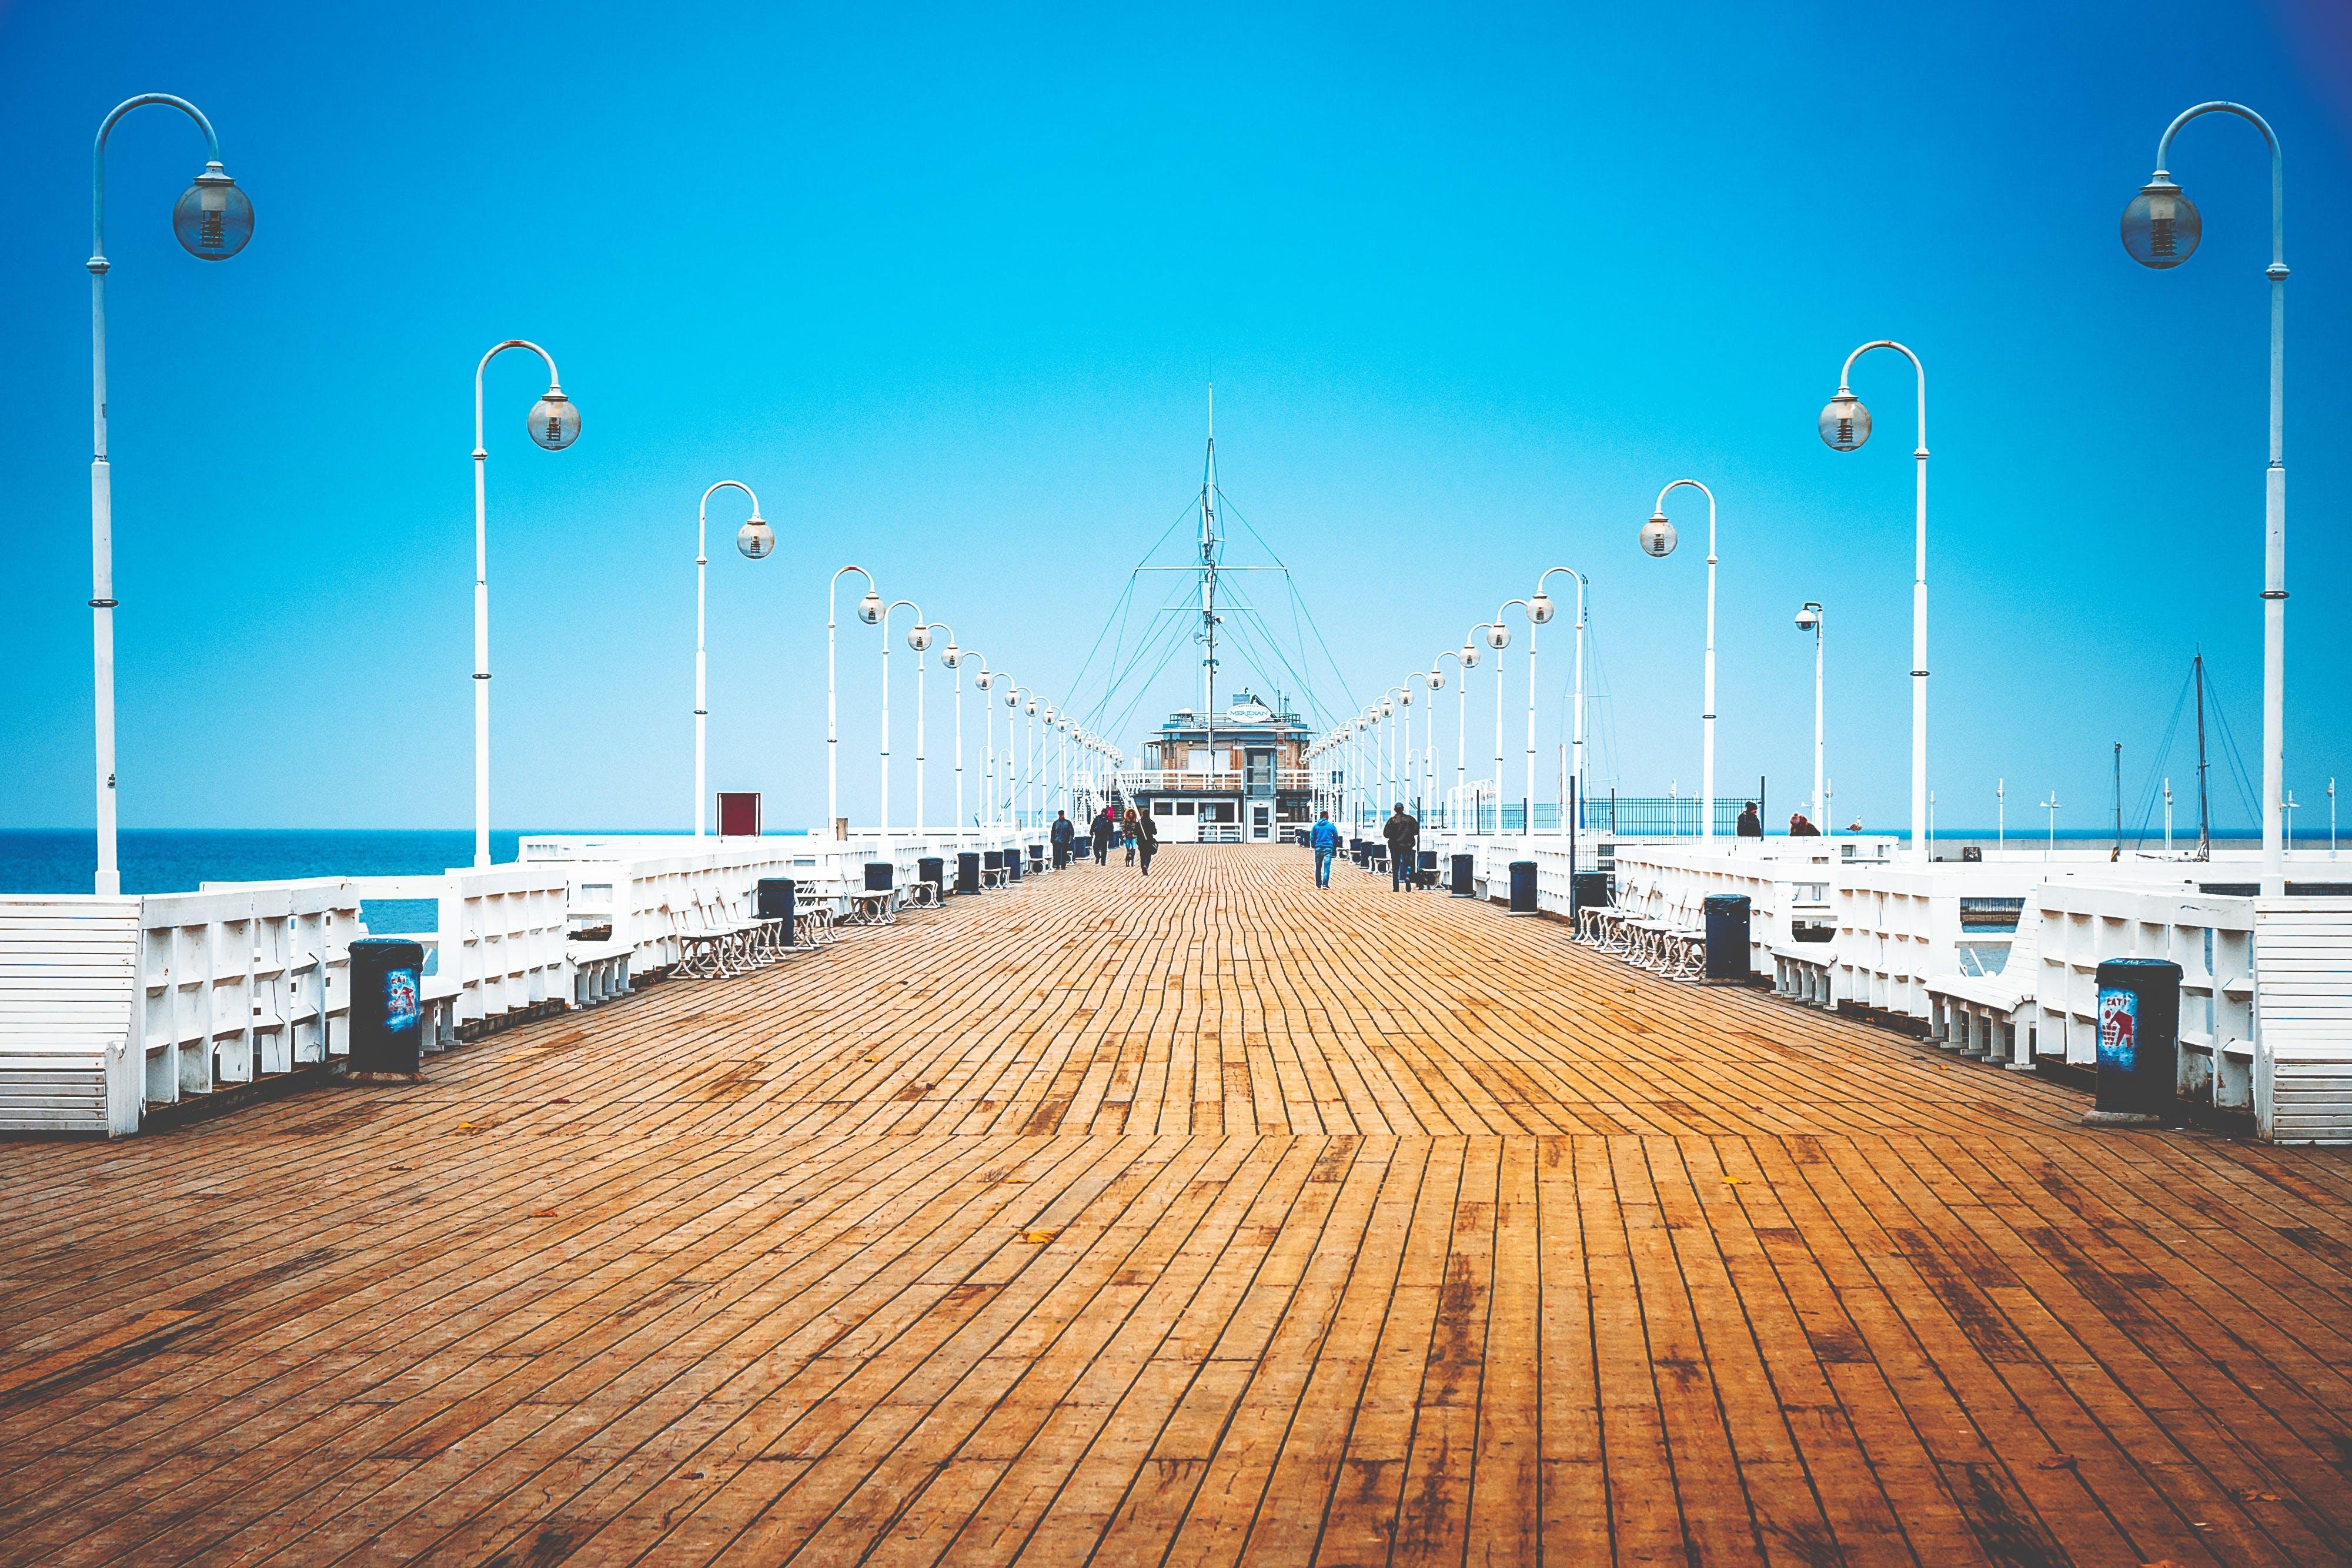 architecture, boardwalk, coast